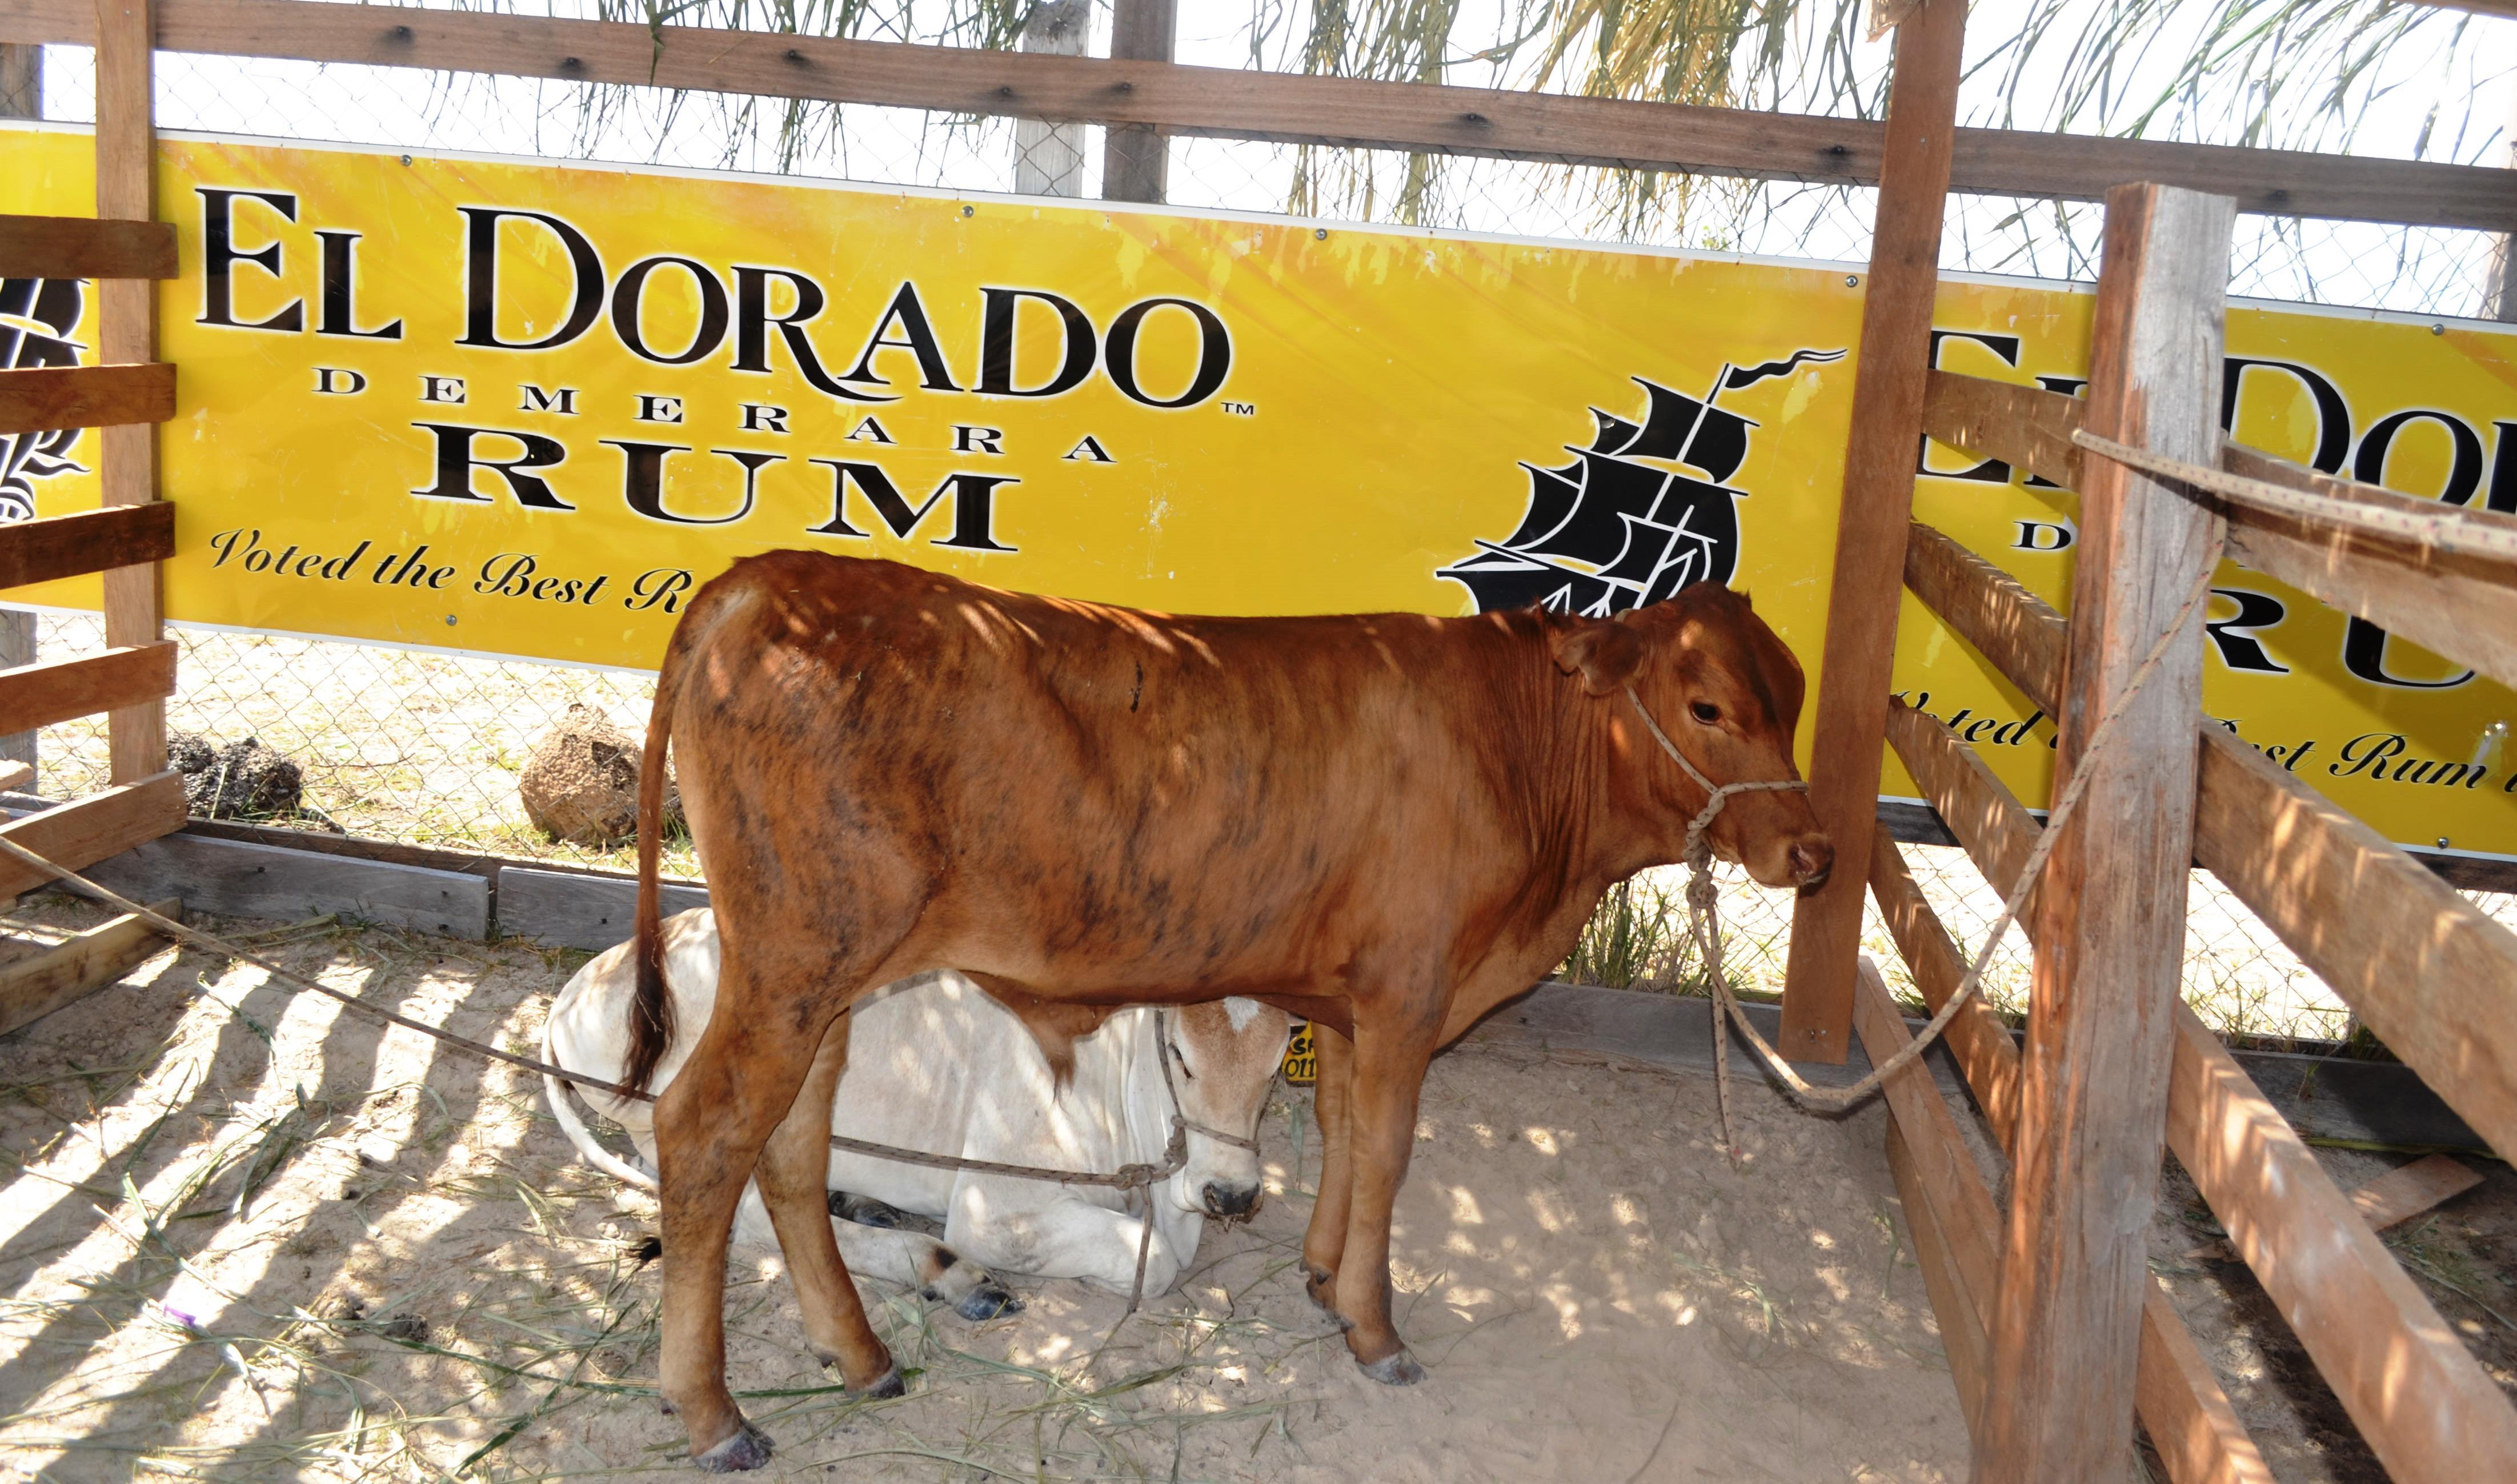 Calf on display at the Rupununi Expo